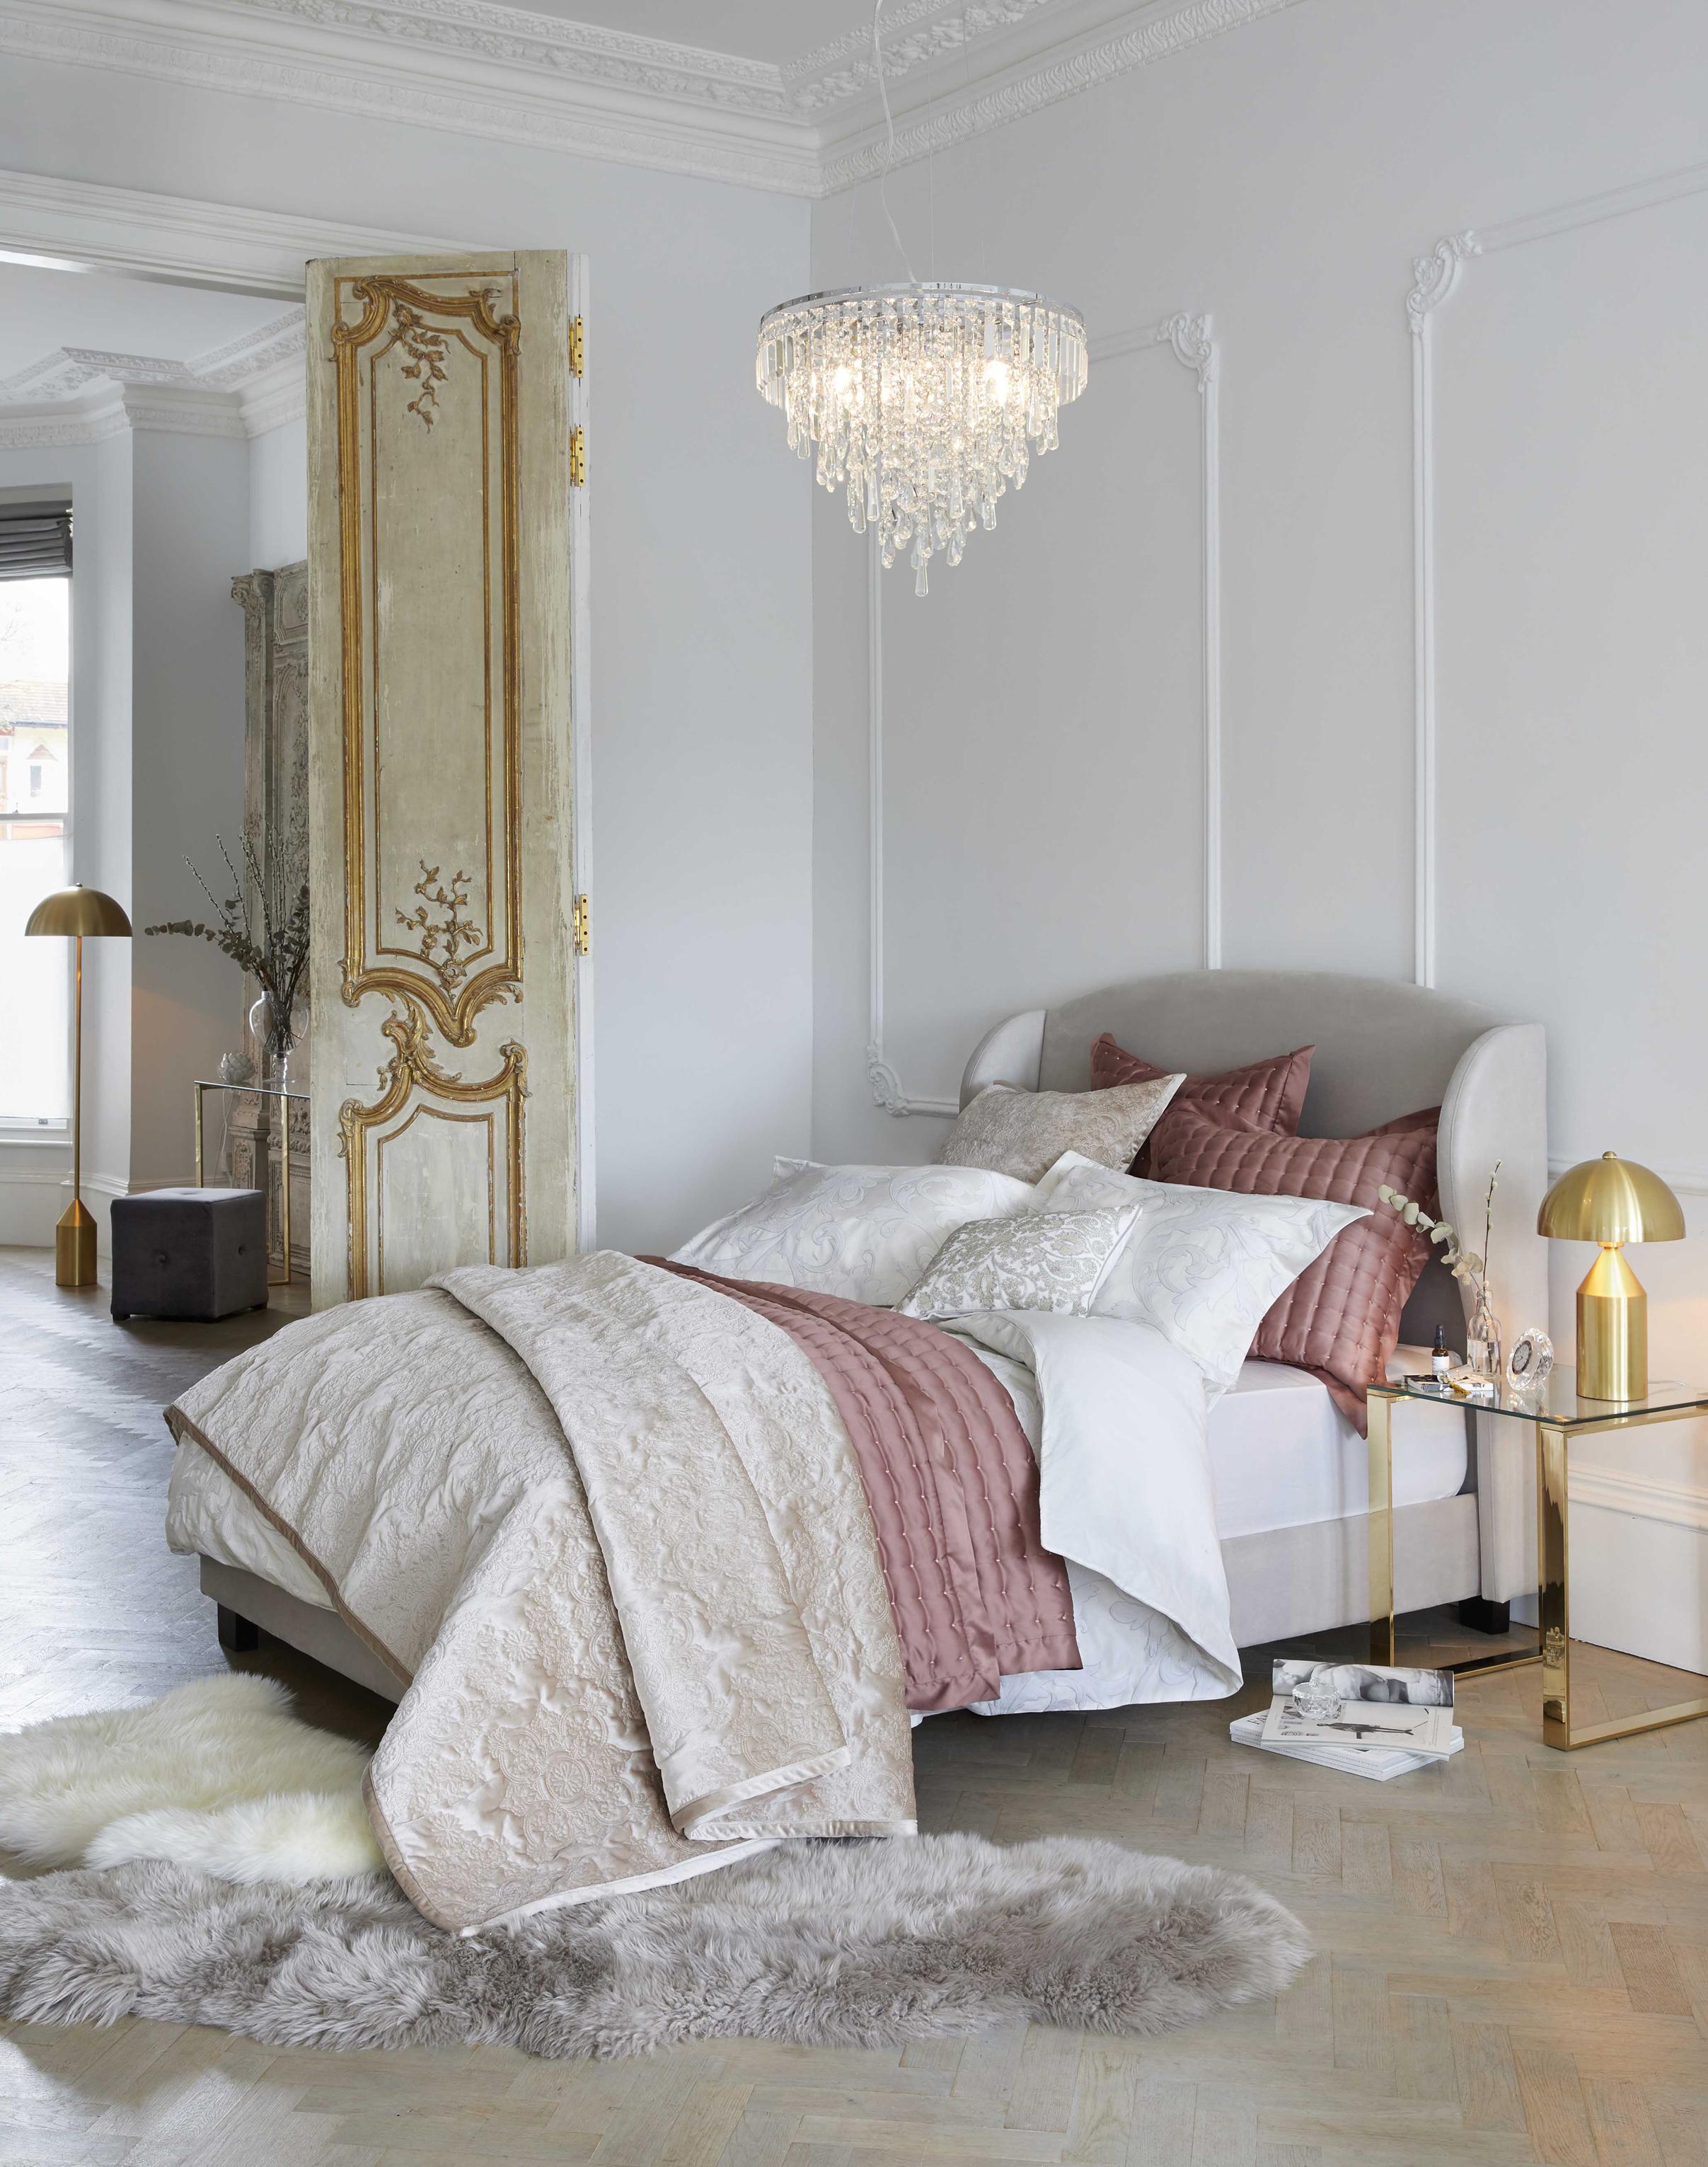 Blenheim Upholstered Bed Frame, £399-£439; Monroe Crystal Fitting Chrome, £219; Dorma Acanthus Jacquard Duvet Cover, £70-£100 & Bedspread,, £150-£170; Dorma Ophelia Ginger Bedspread, £100-£120 & Continental Square Pillowcase, £20; Dorma Arabesque Cushion, £30, Dunelm (Dunelm/PA)